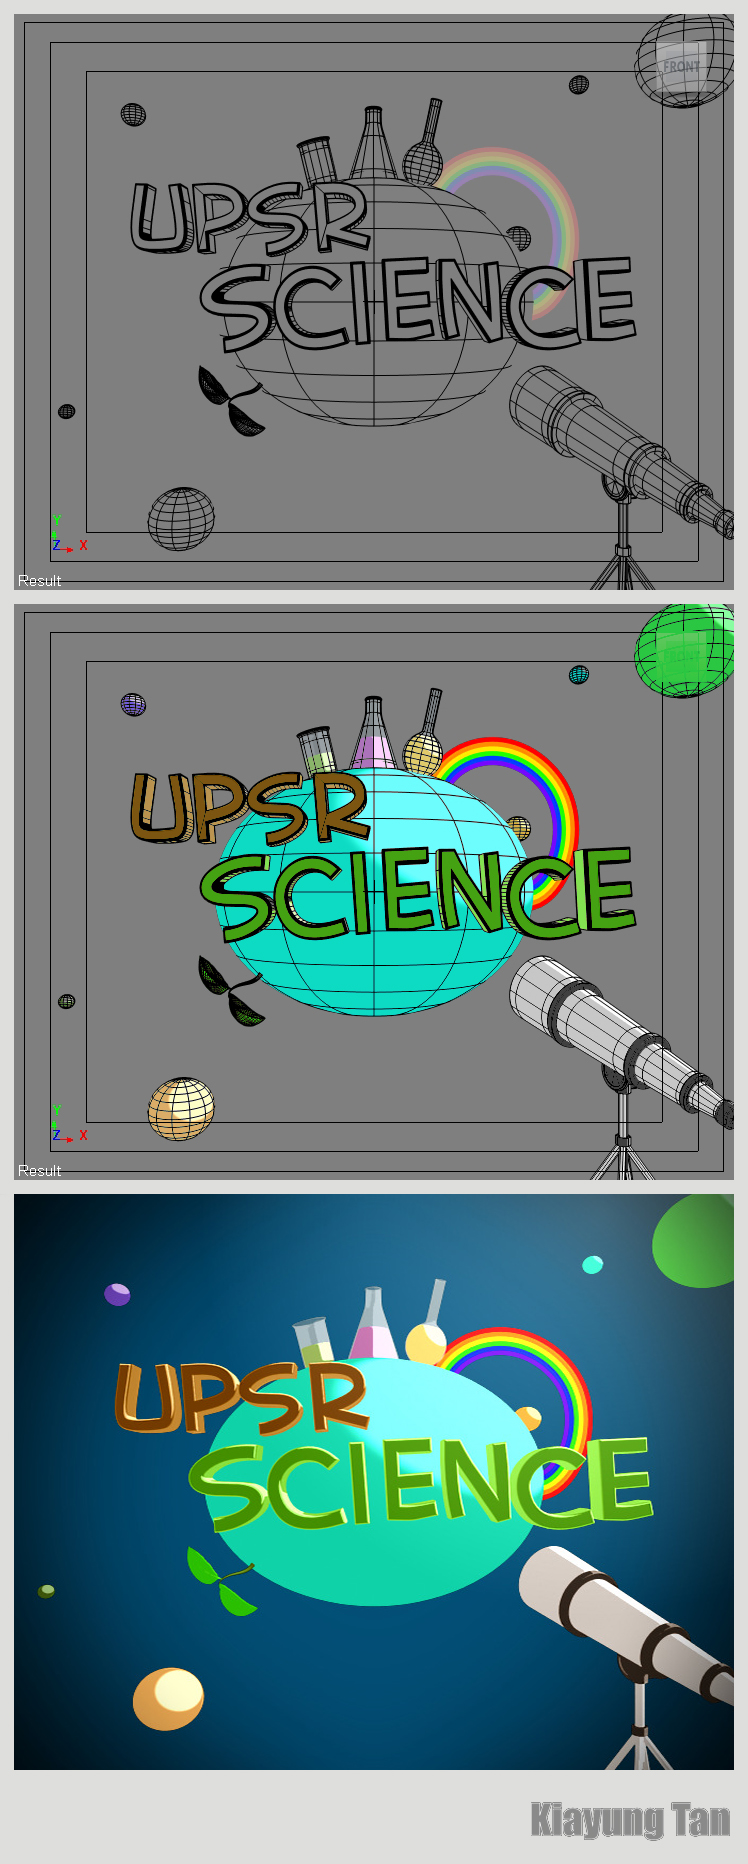 UPSR Science Wireframe by kiayt